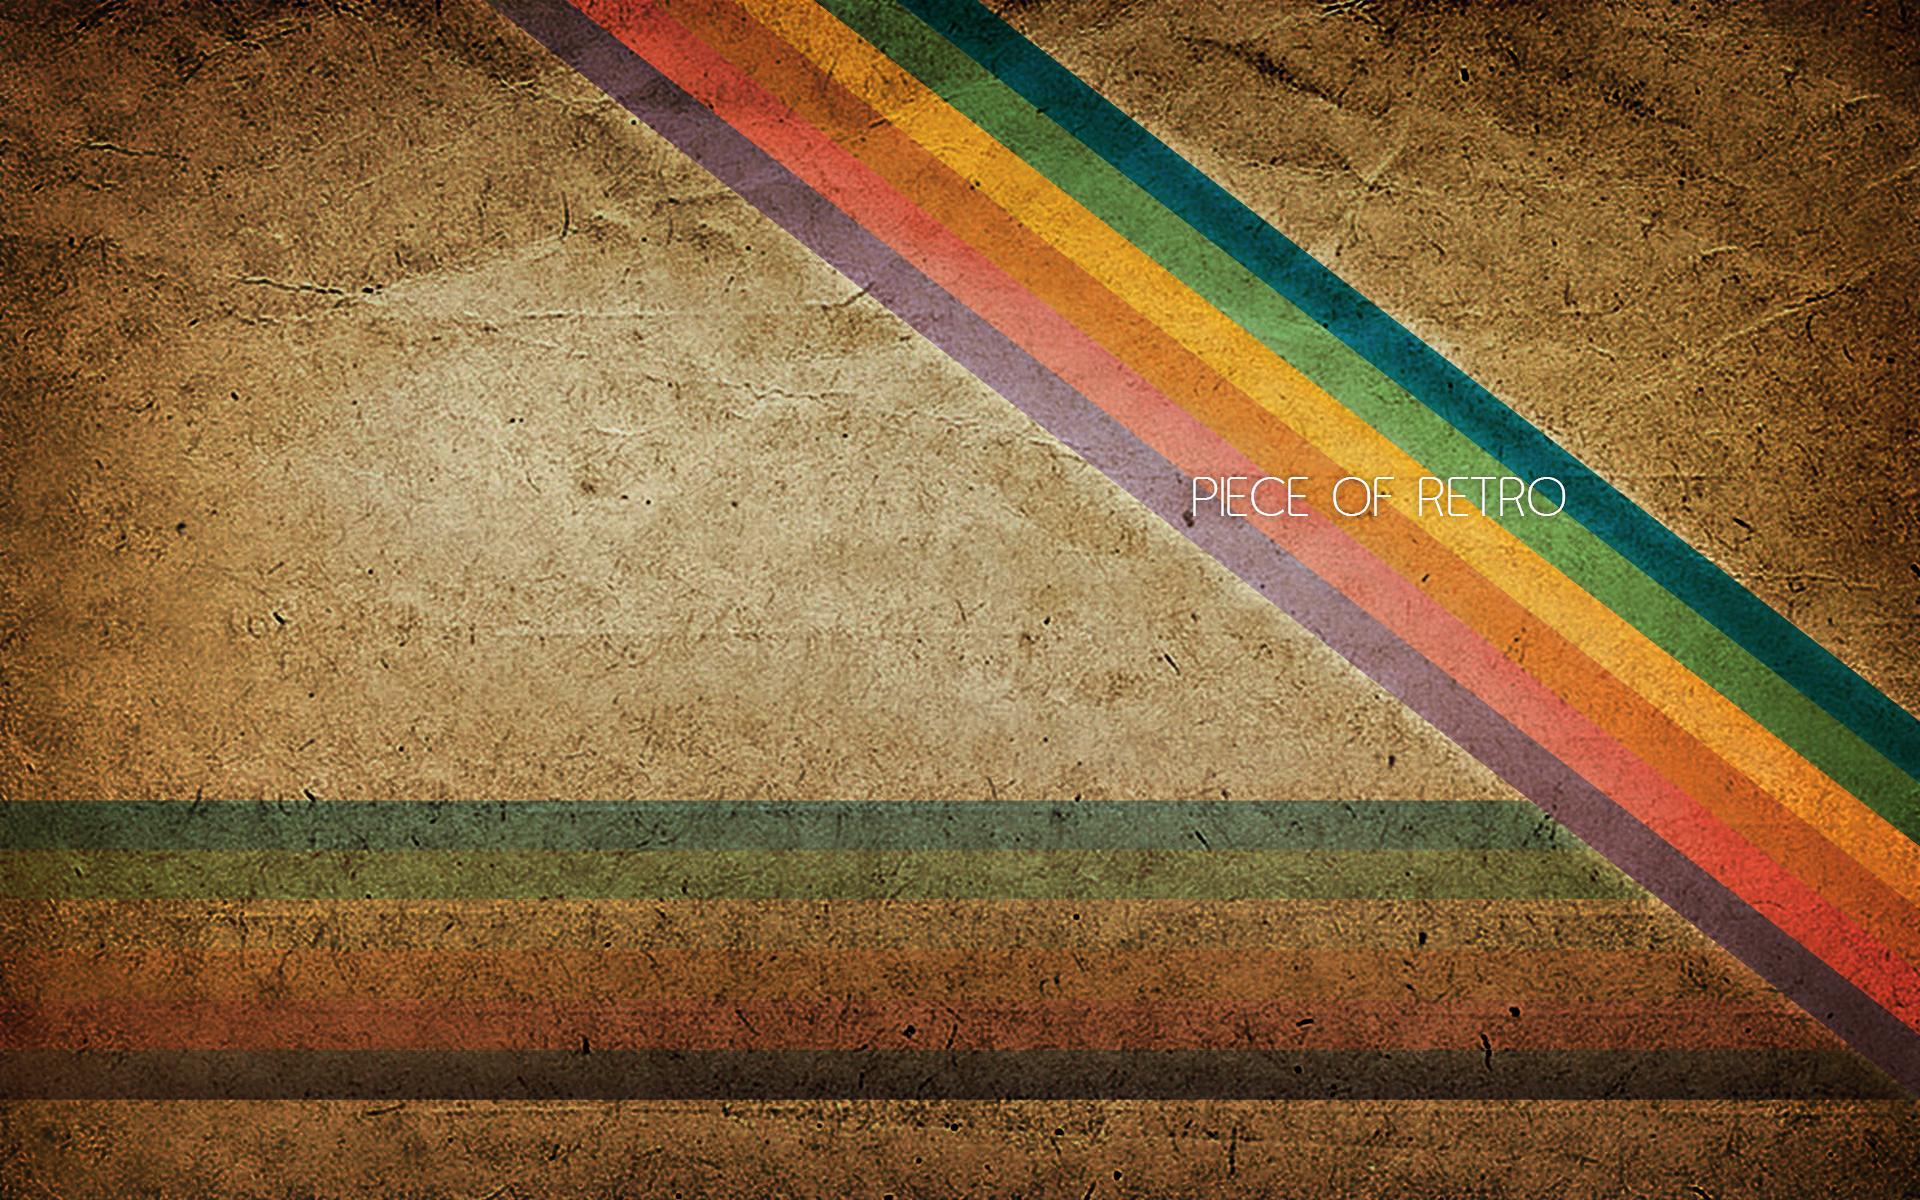 Hd Retro Wallpaper Pc 525 Retro Wallpapers Hd 3175102 Hd Wallpaper Backgrounds Download